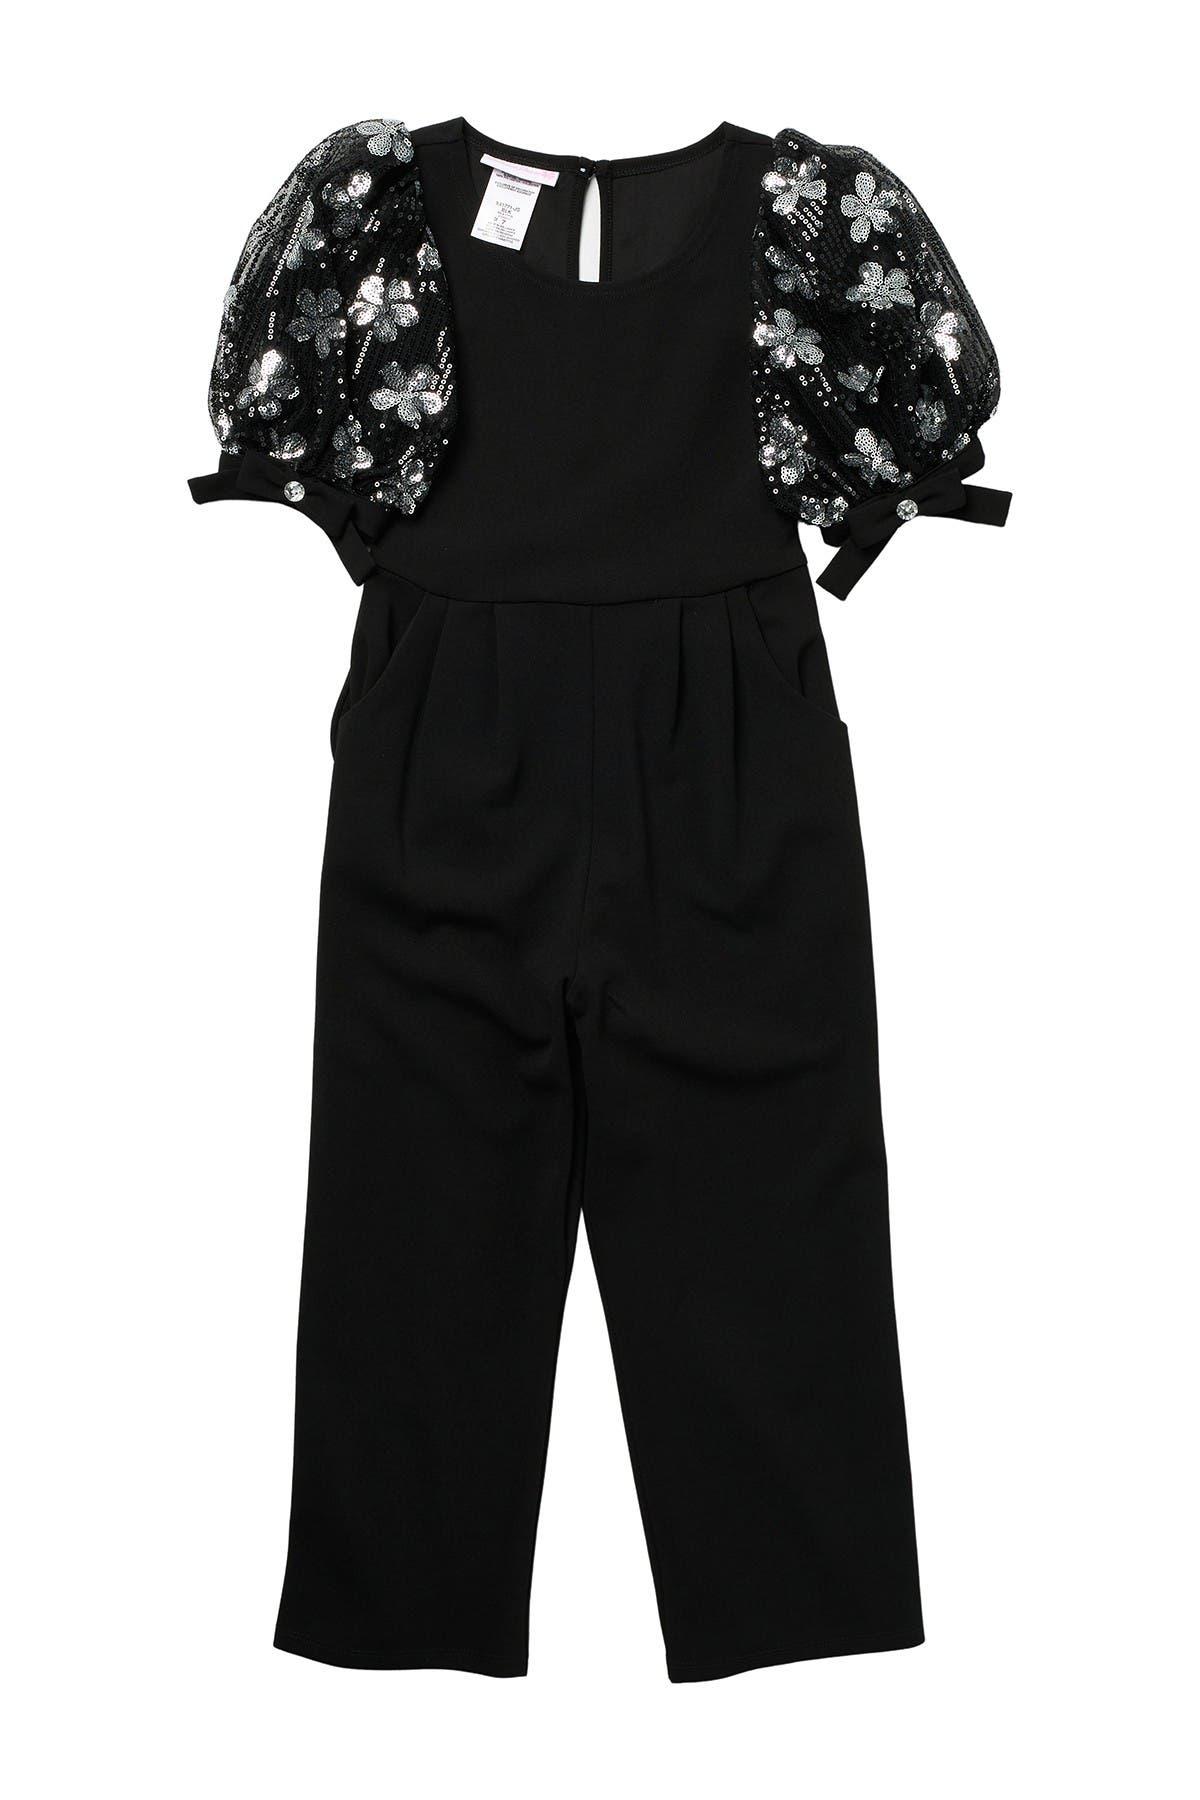 Image of GERSON & GERSON Floral Bubble Sleeve Jumpsuit